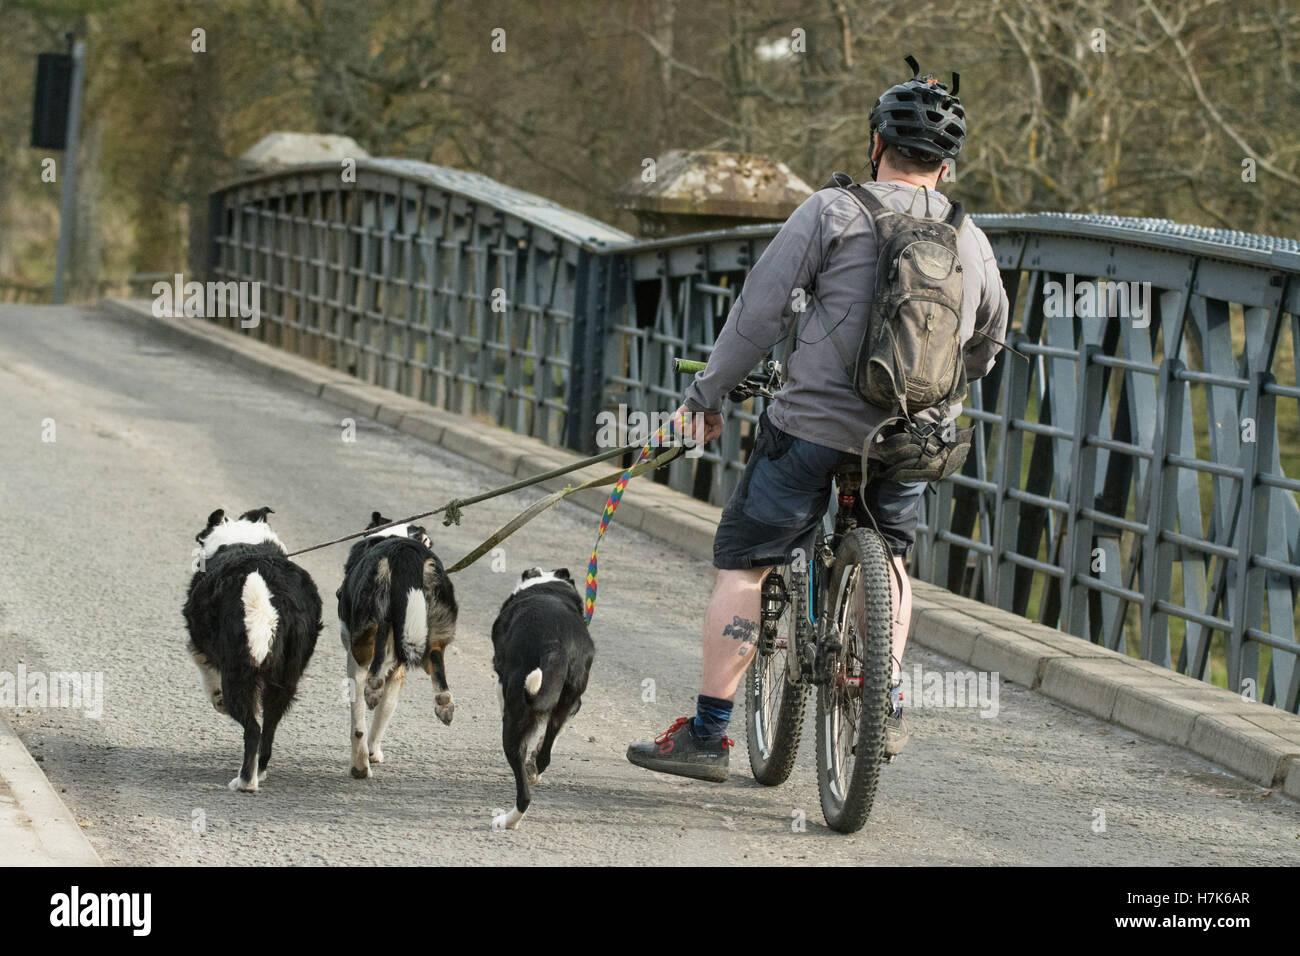 dog walking on a bike - Stock Image